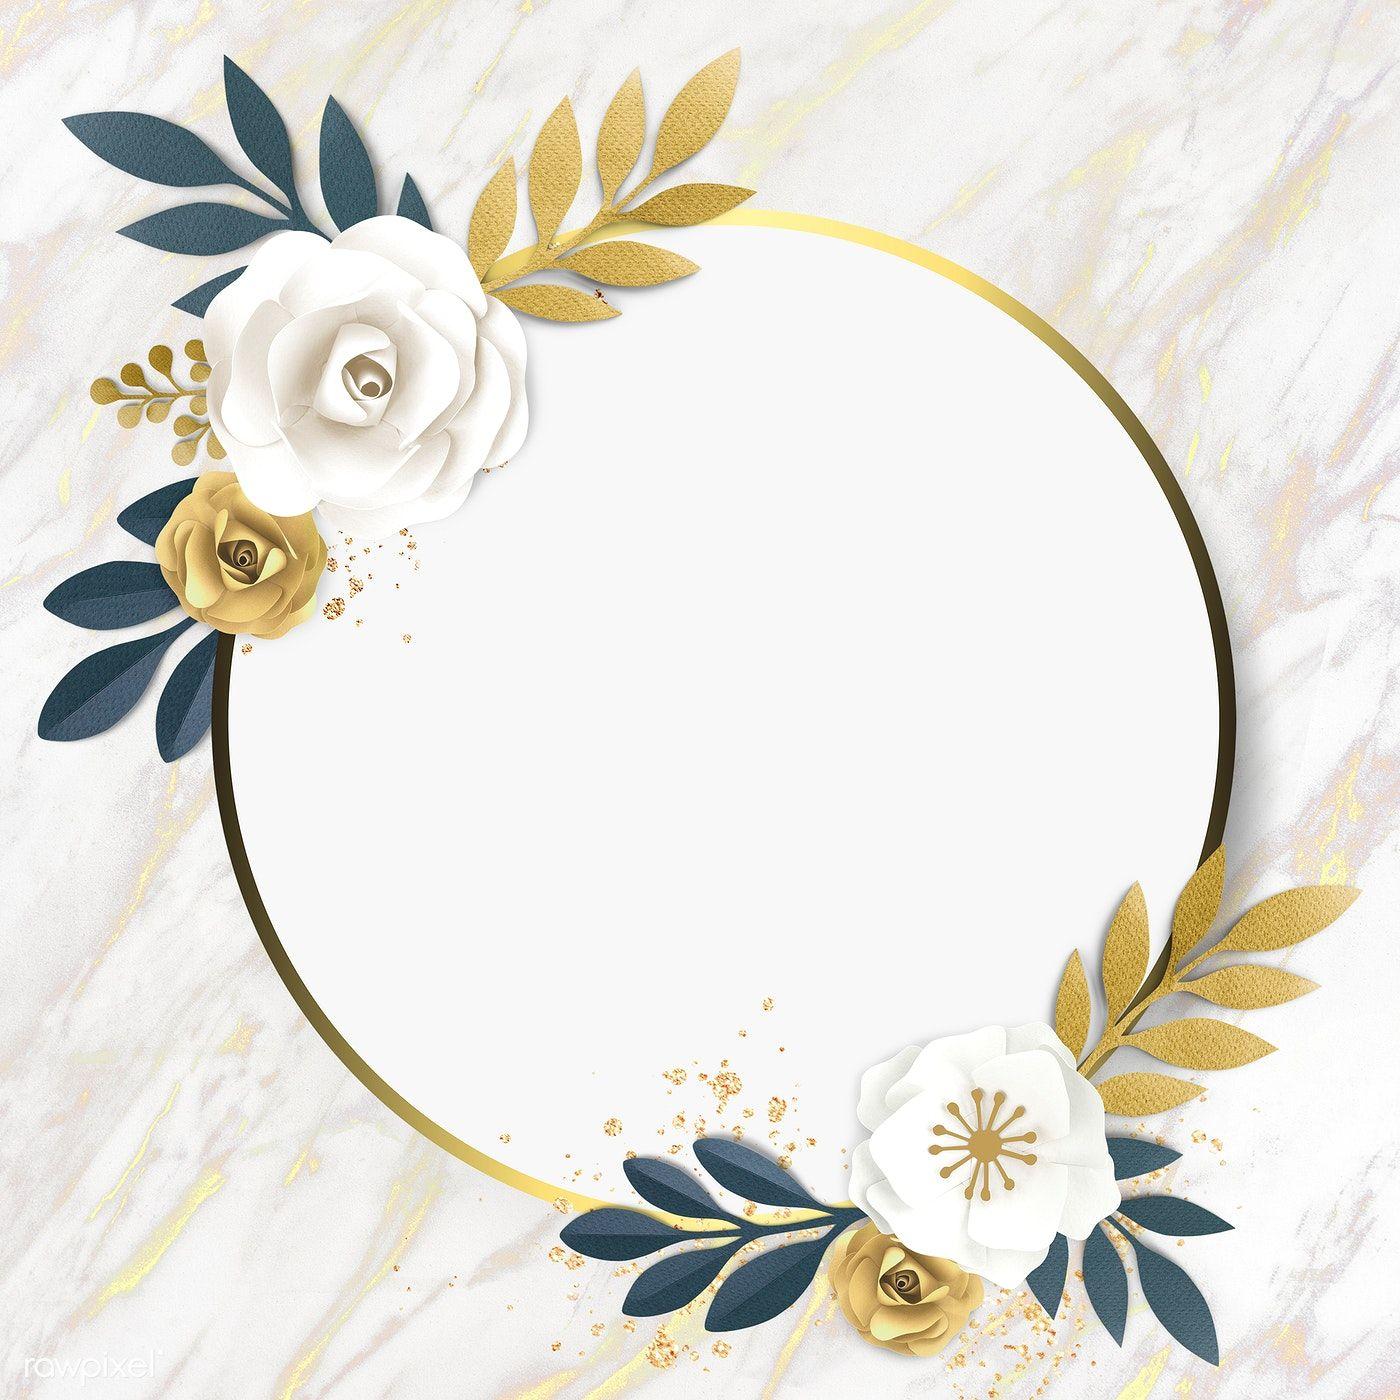 Download premium image of Round paper craft flower frame